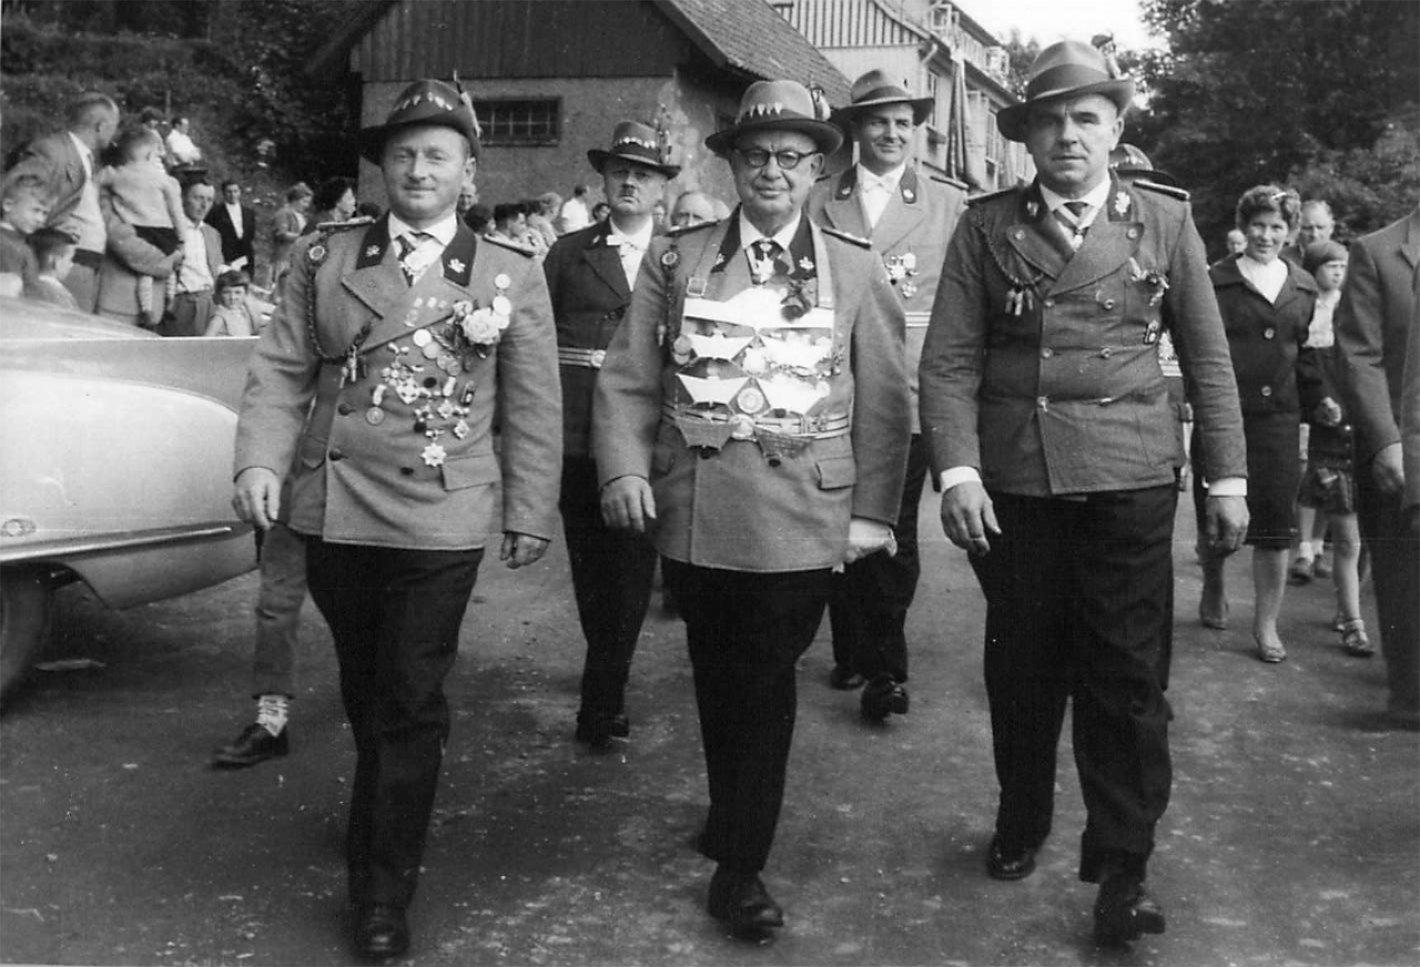 Schützenkönig 1959